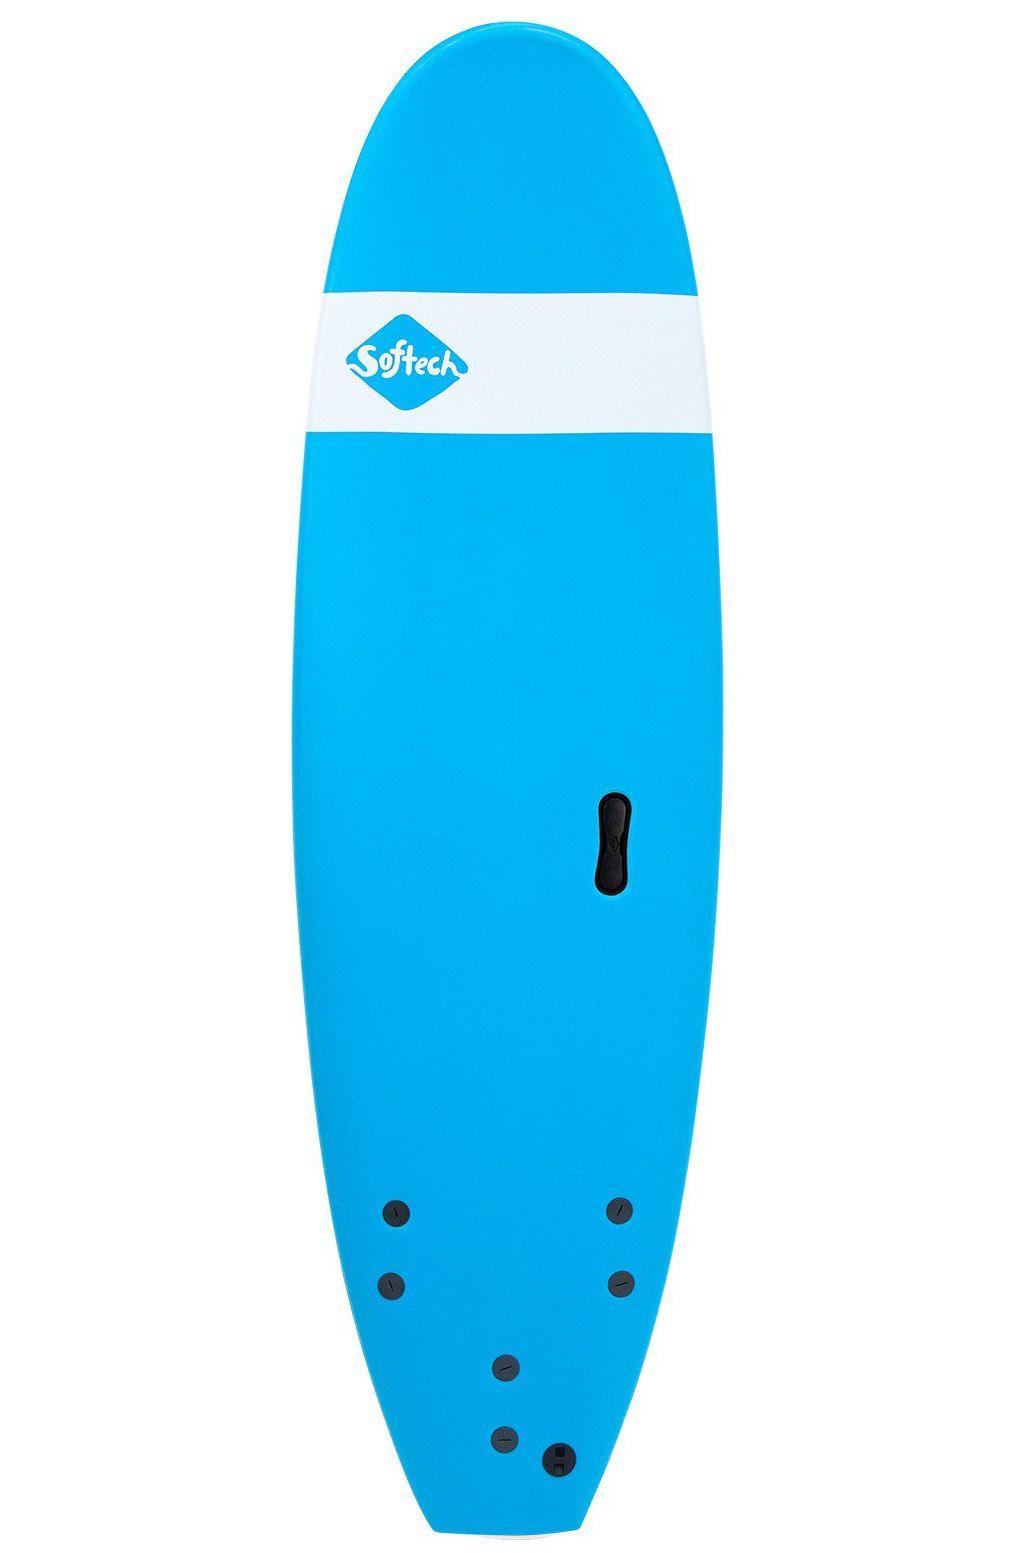 Prancha Surf Softech 8'0 ROLLER BLUE Square Tail - Color FCS 8ft0